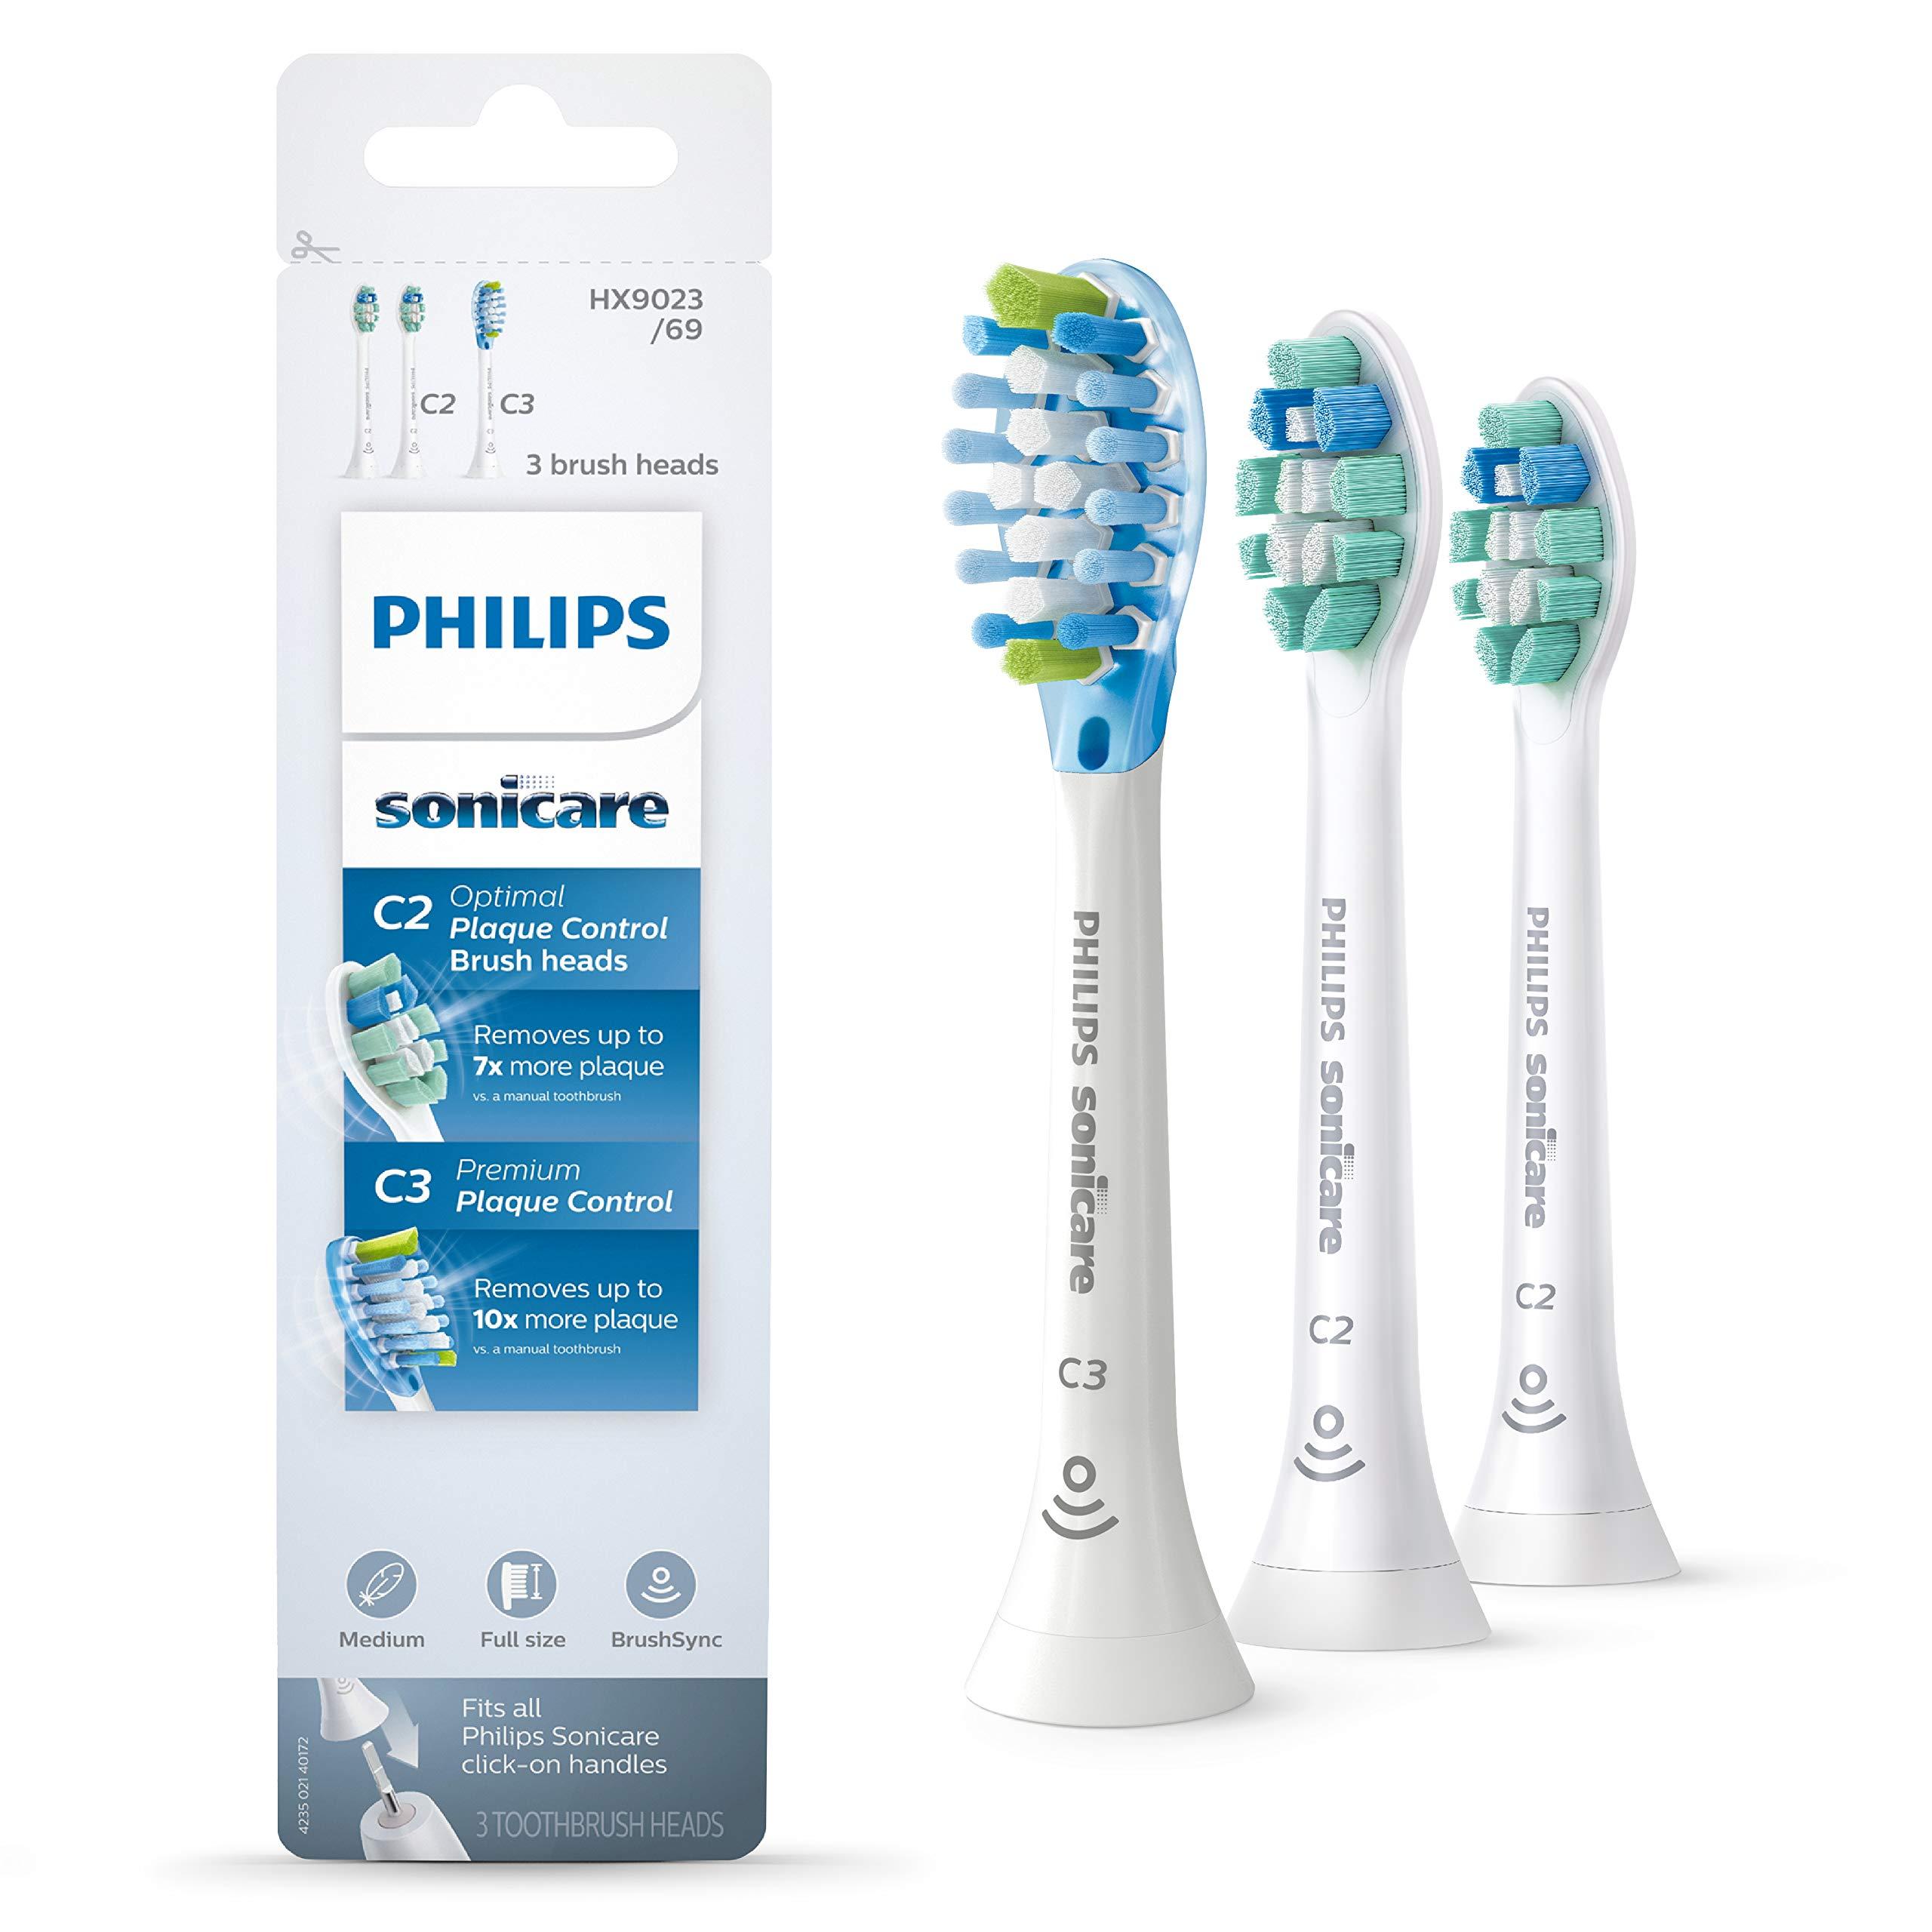 Genuine Philips Sonicare toothbrush head variety pack - C3 Premium Plaque Control & C2 Optimal Plaque Control, HX9023/69, 3-pk, white by Philips Sonicare